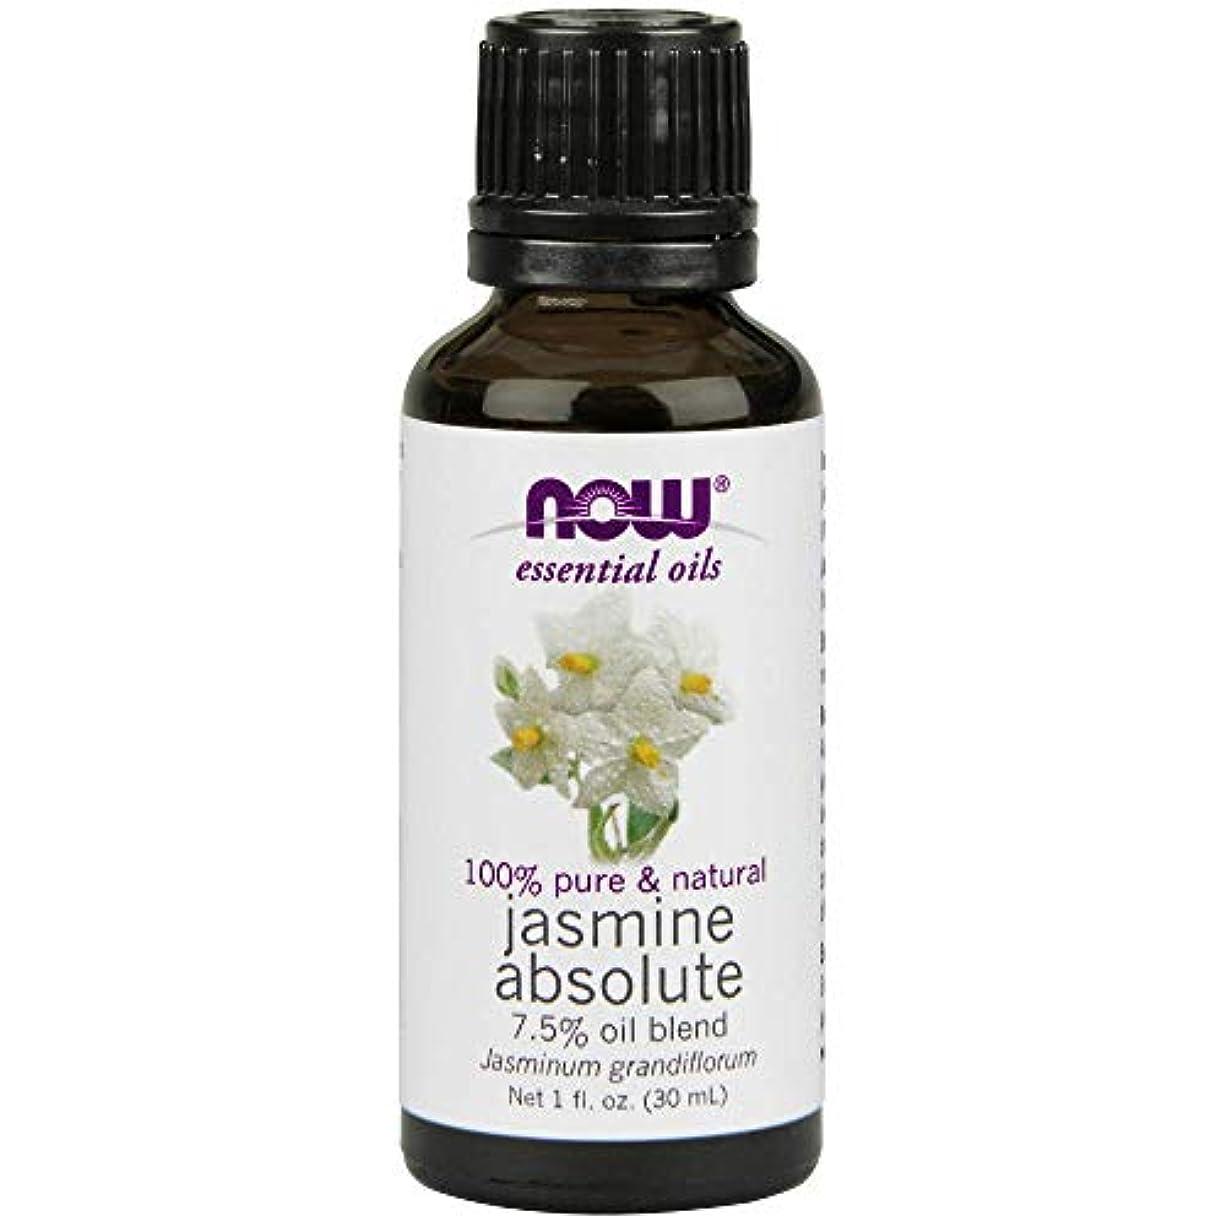 氏リンク冷凍庫Now - Jasmine Absolute Oil 7.5% Oil Blend 1 oz (30 ml) [並行輸入品]